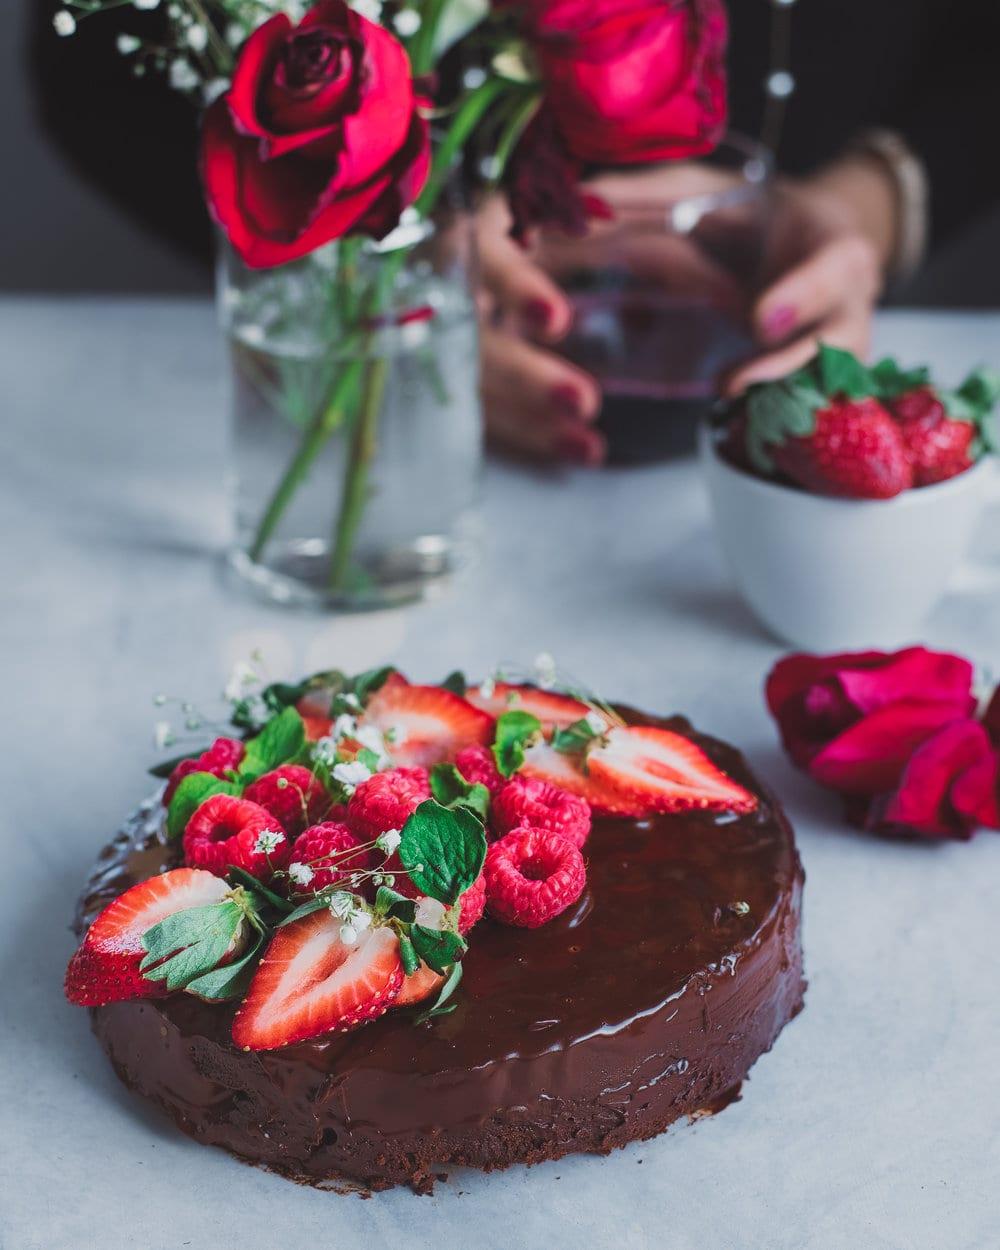 Instant Pot vegan chocolate cake